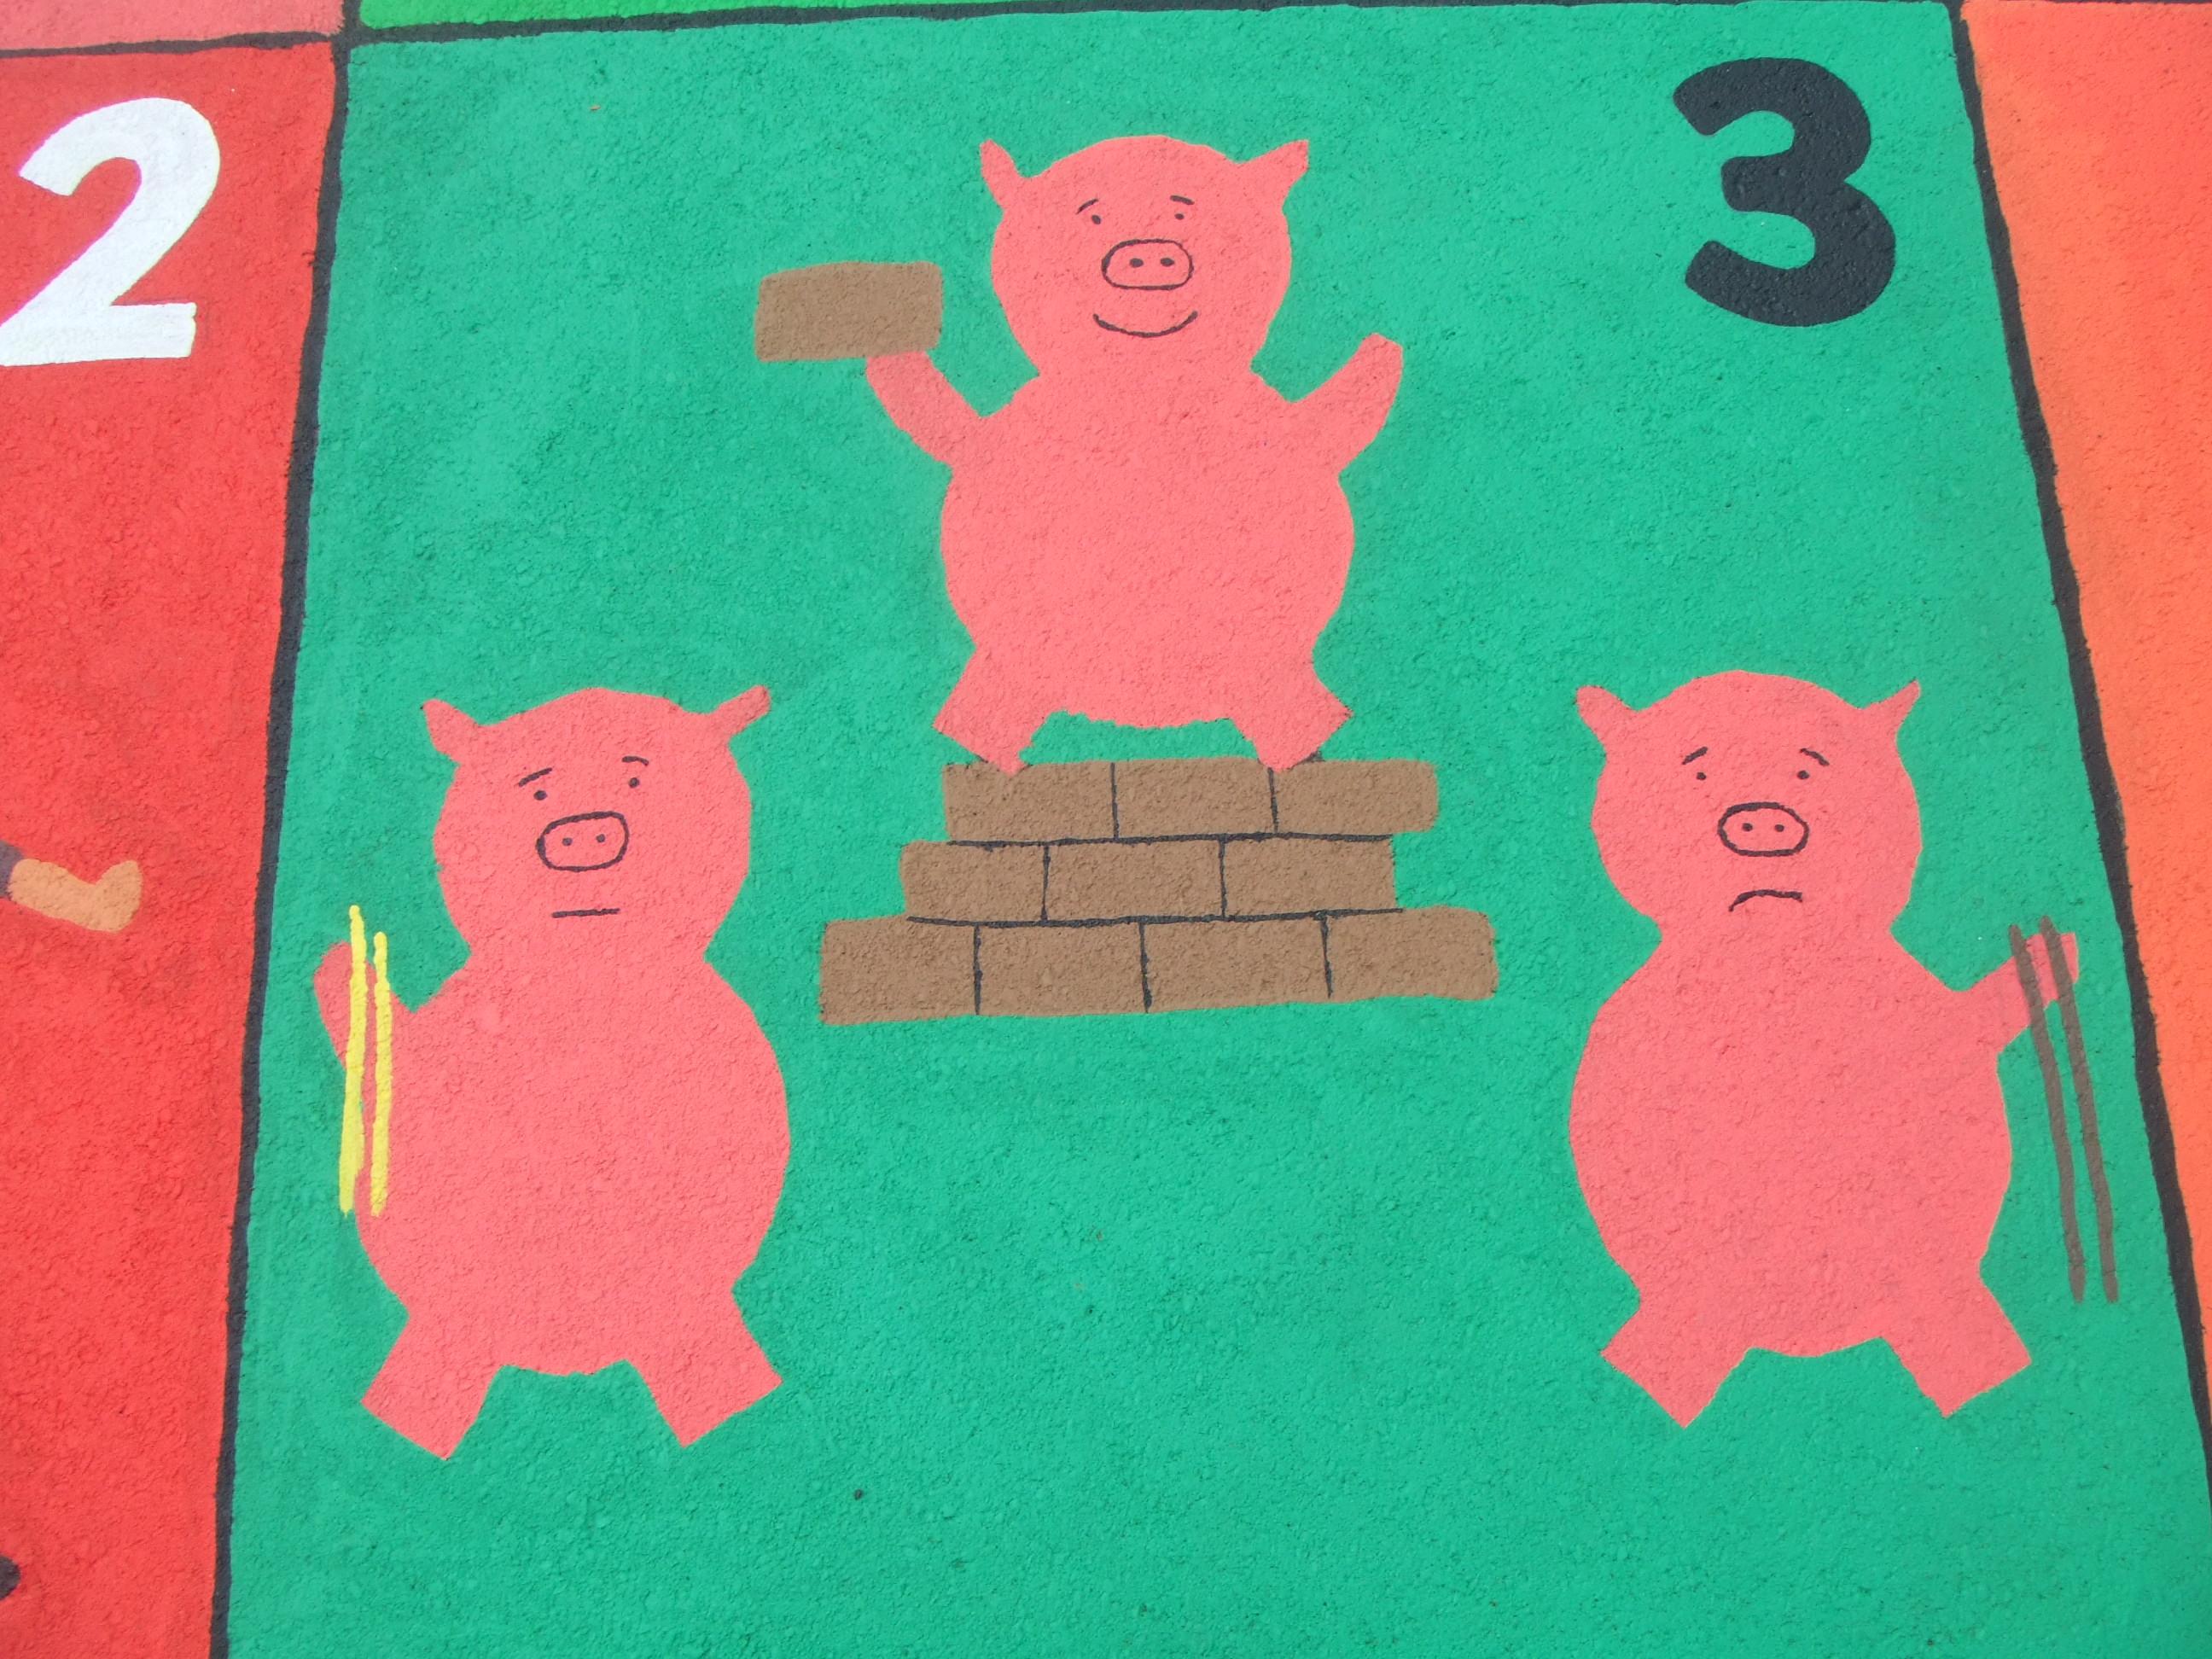 3. LITTLE PIGS